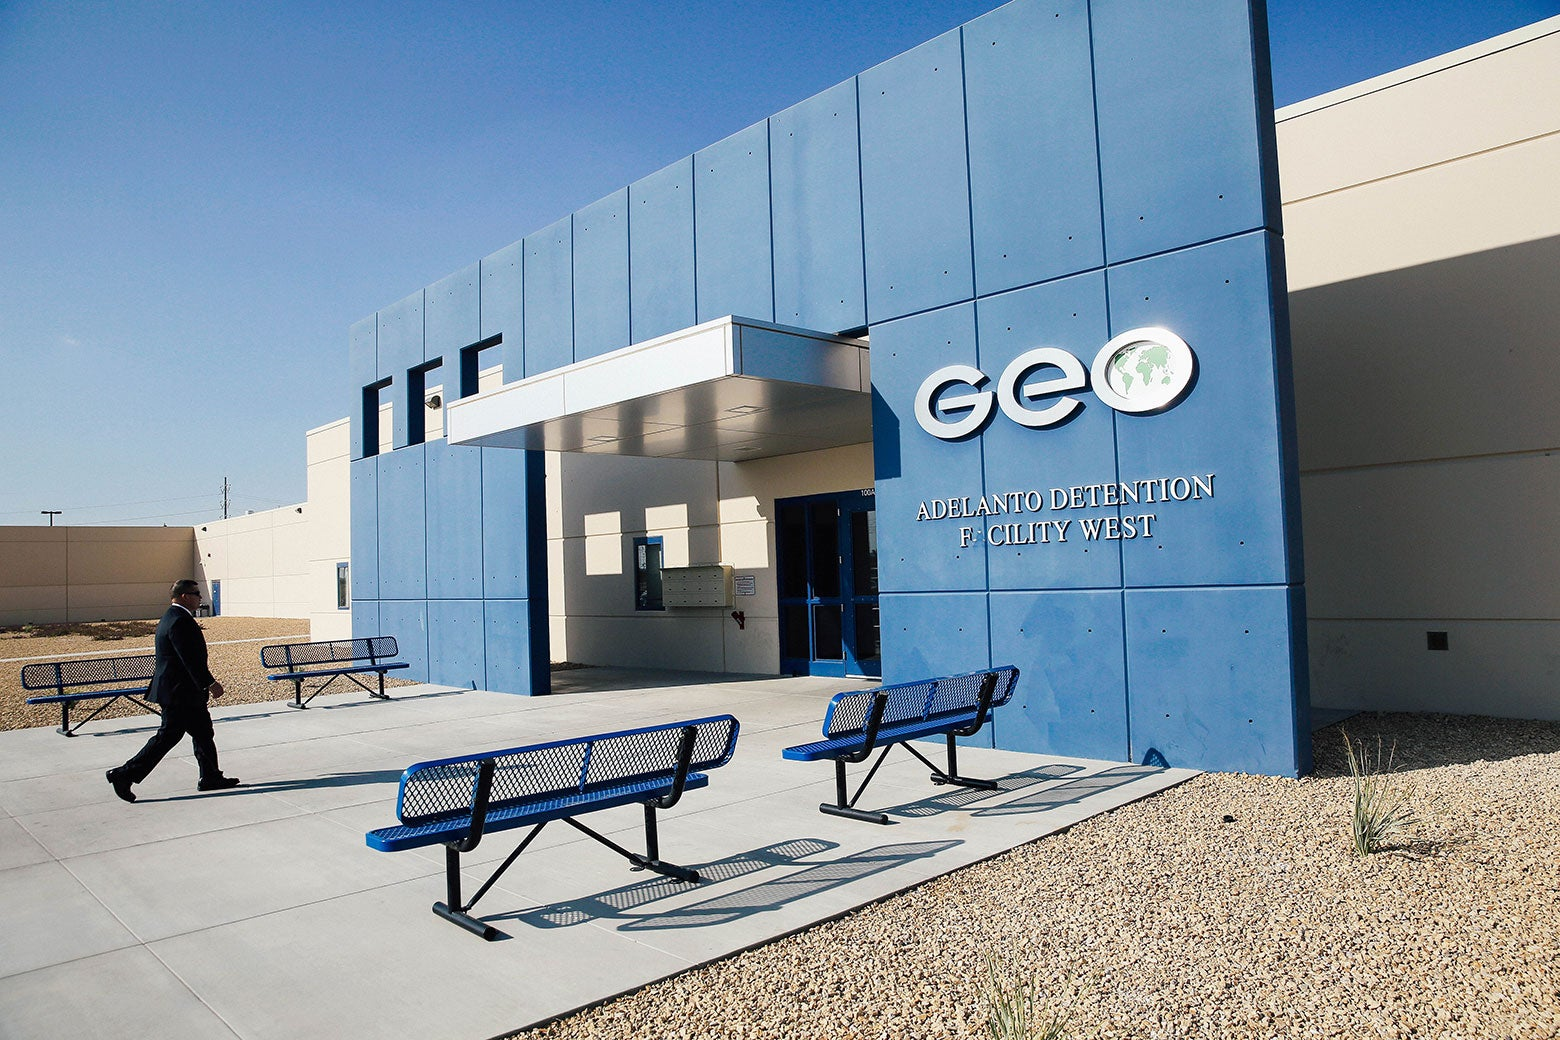 The Adelanto Detention Facility in California.